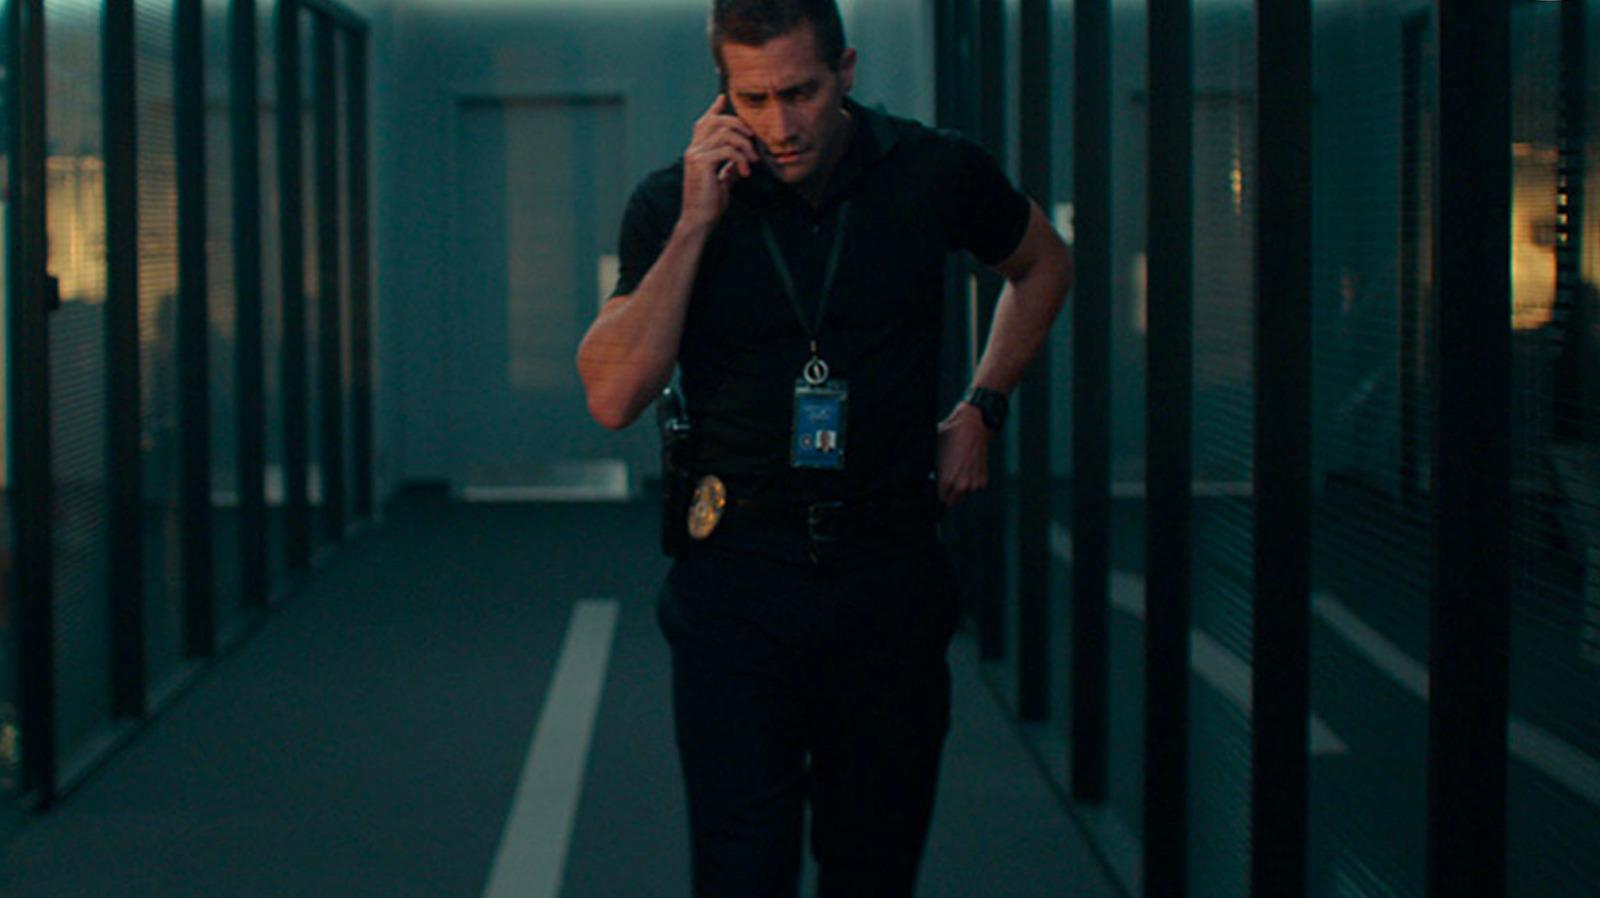 Joe Byler (Jake Gyllenhaal) - The Guilty